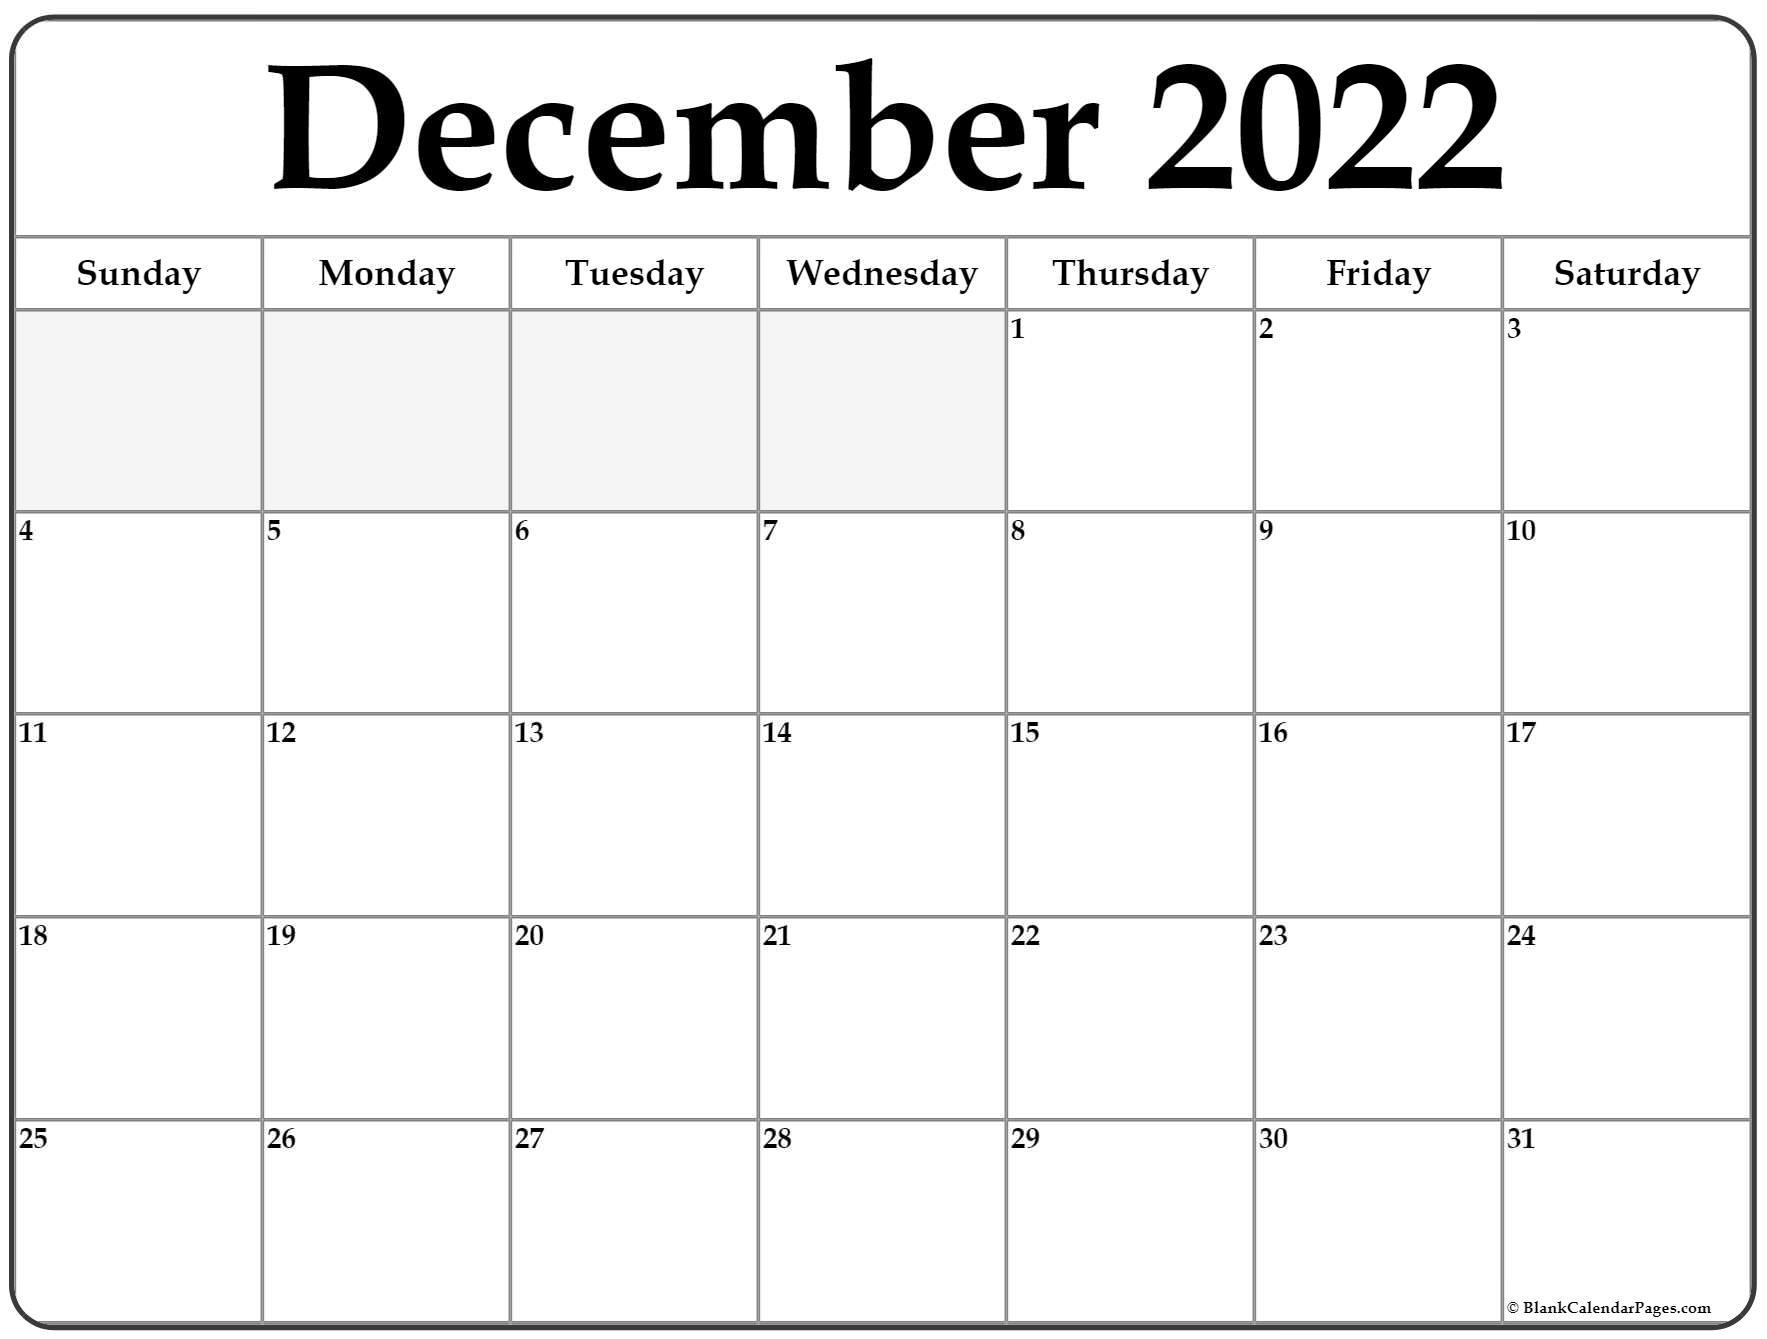 Free Printable December 2022 Calendar.December 2022 Calendar Free Printable Calendar Templates